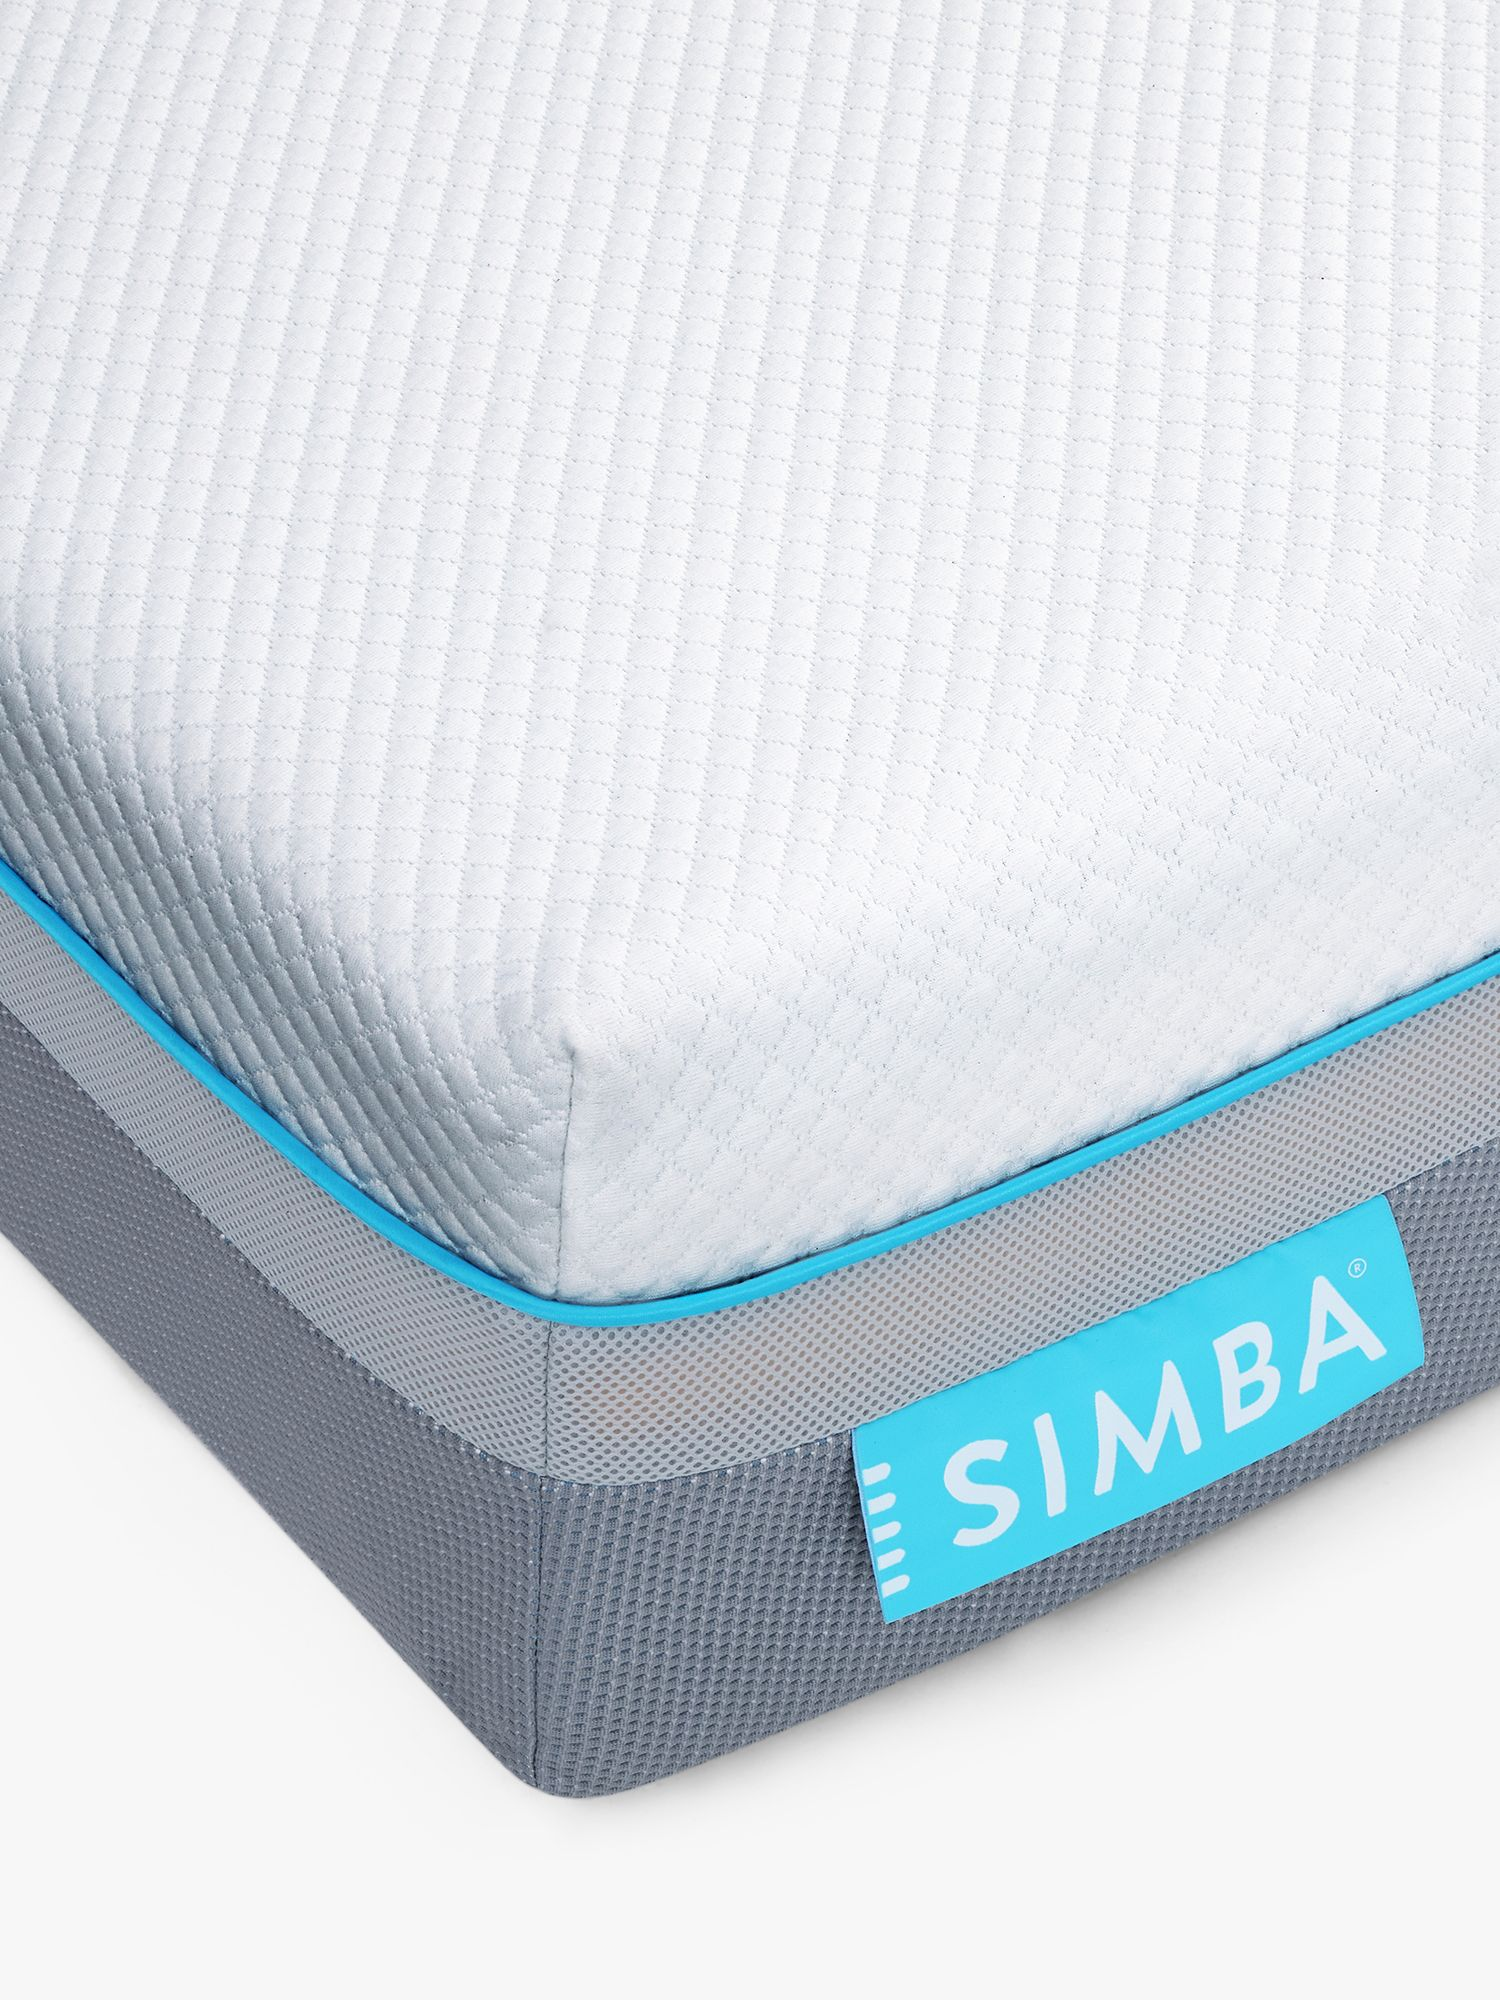 Simba Simba Hybrid® Air Cool Pocket Spring Memory Foam Mattress, Medium Tension, Double